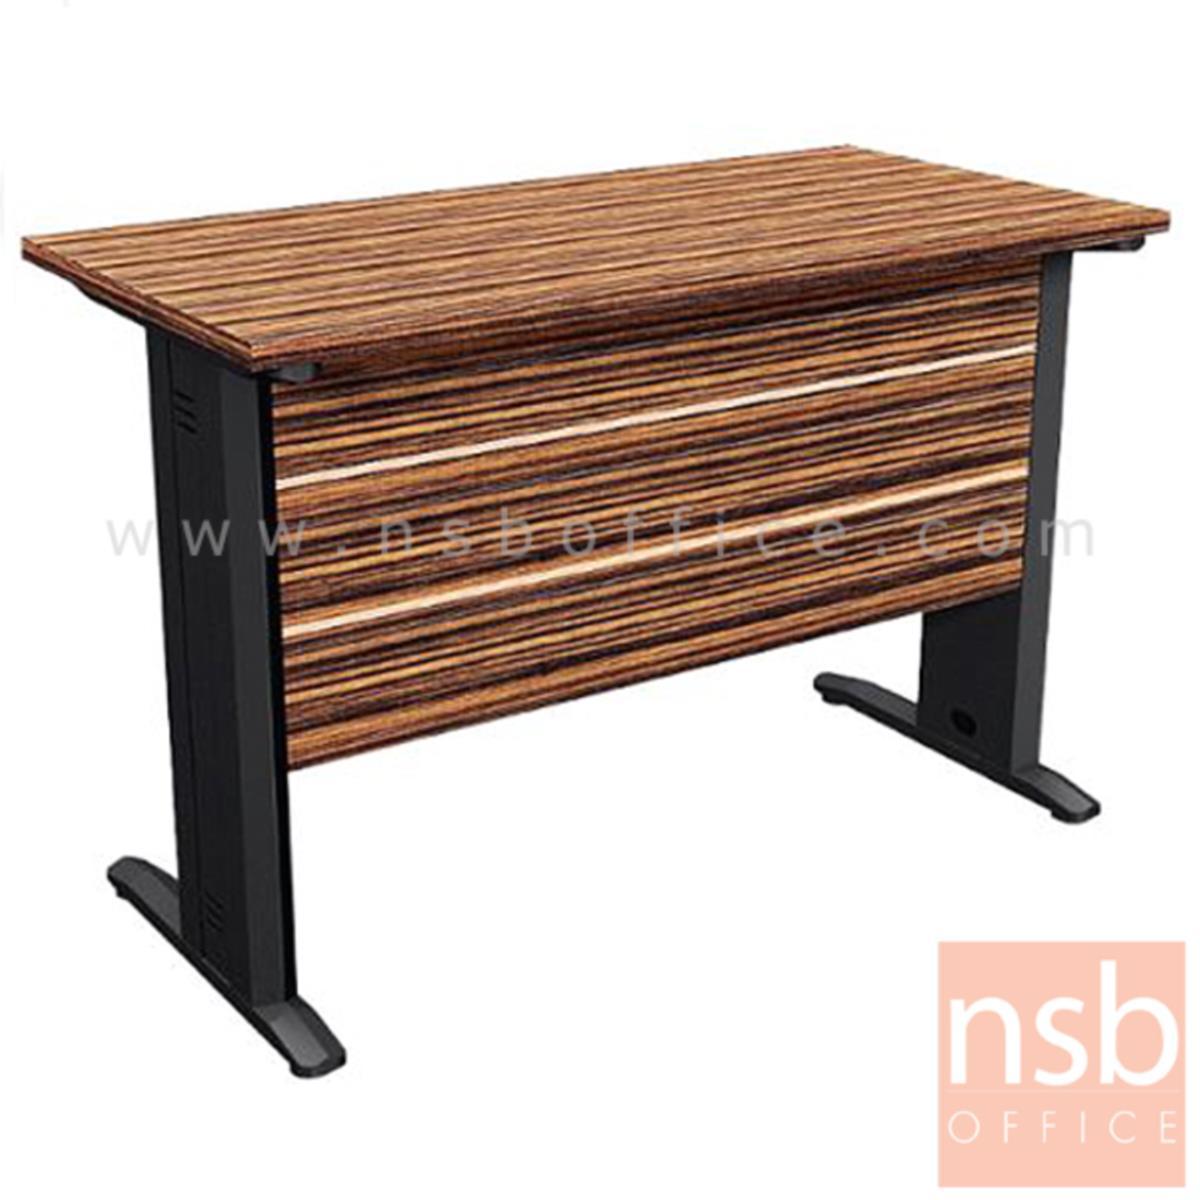 A26A025:โต๊ะทำงาน รุ่น Private Blend ขนาด 120W ,150W cm.  ขาเหล็ก สีลายไม้ซีบราโน่ตัดดำ ขอบ ROSEGOLD